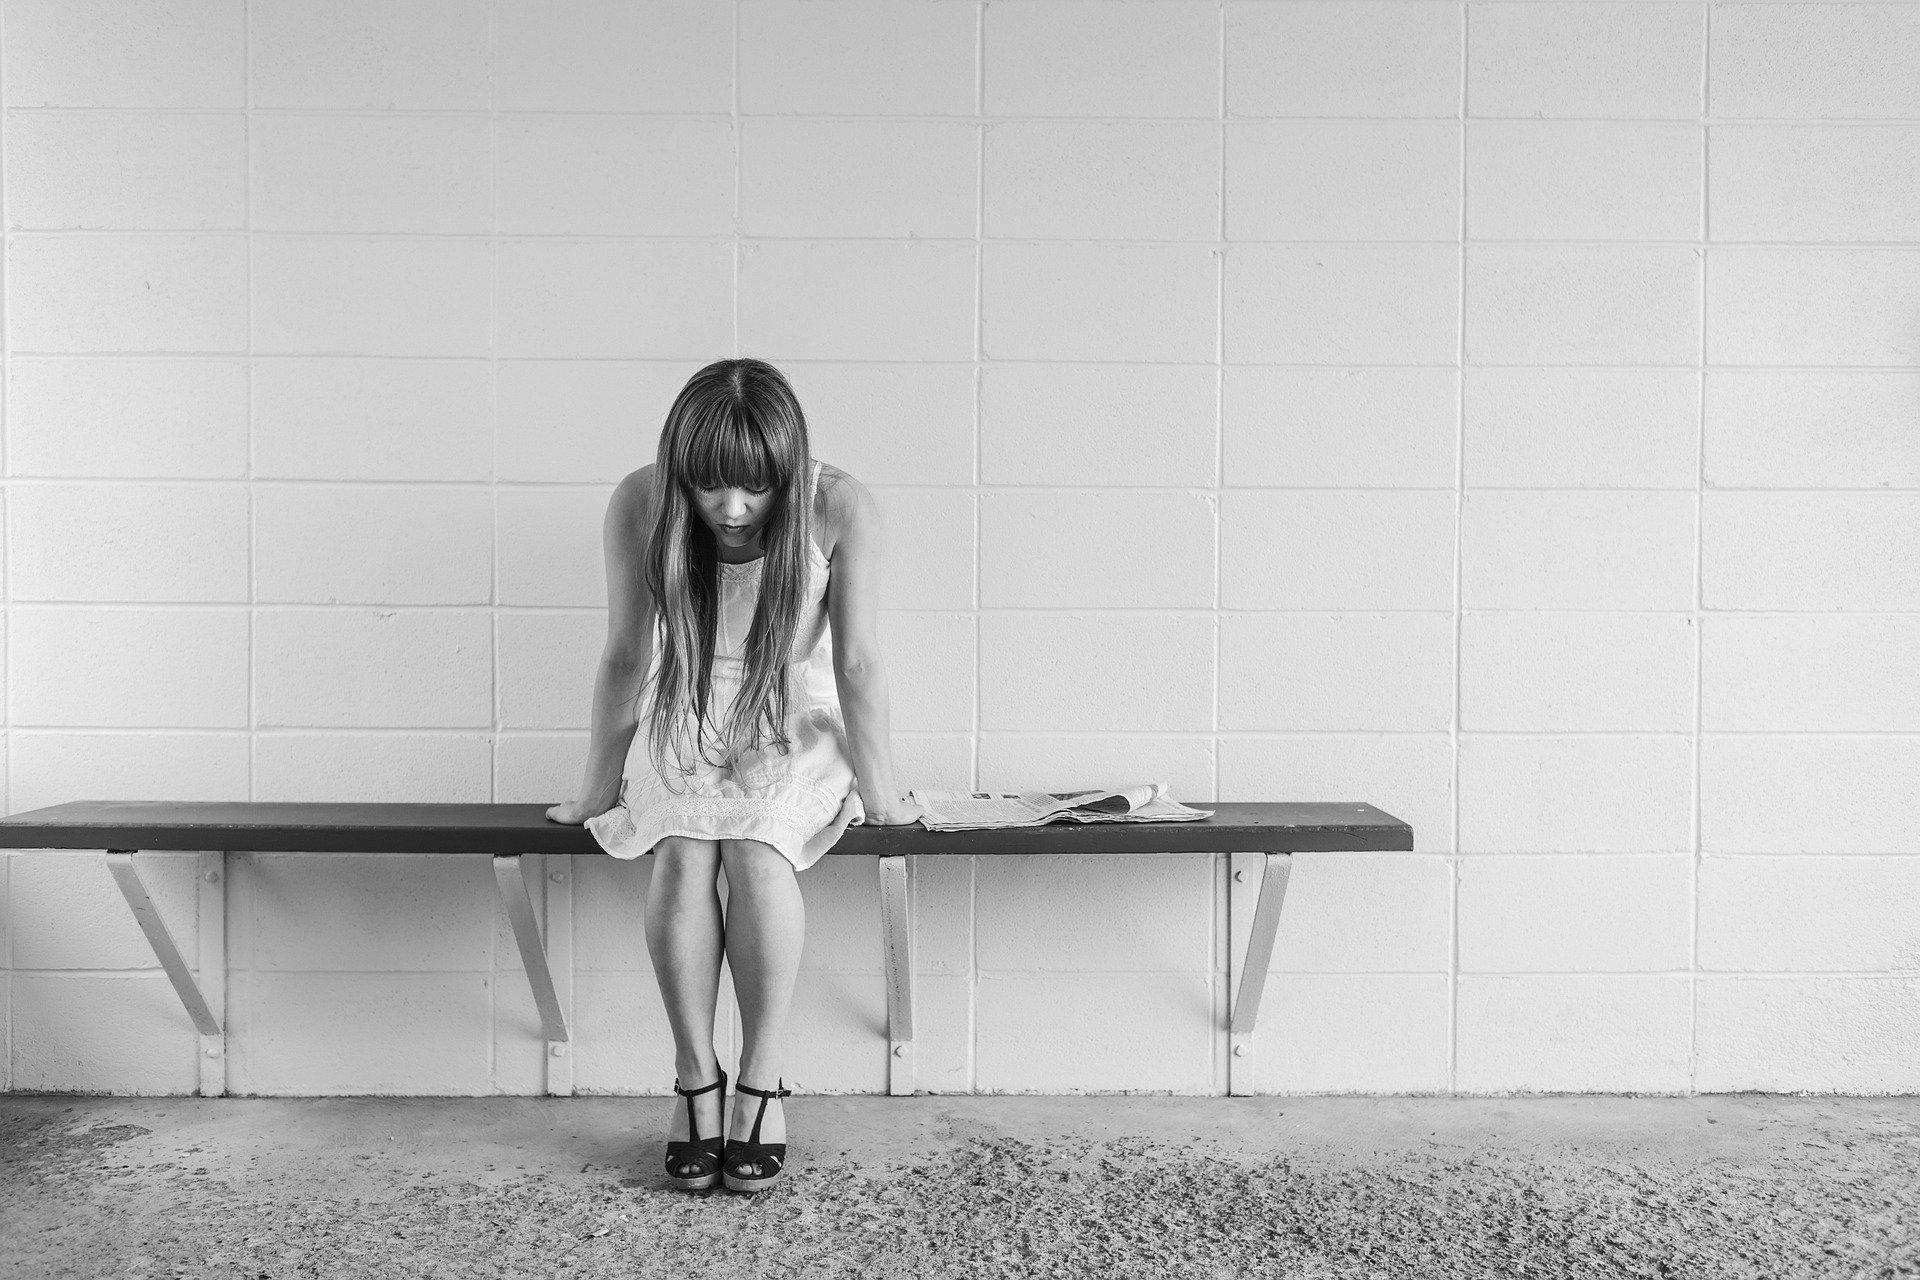 worried-girl-413690_c_ryan-mc-guire_pixabay